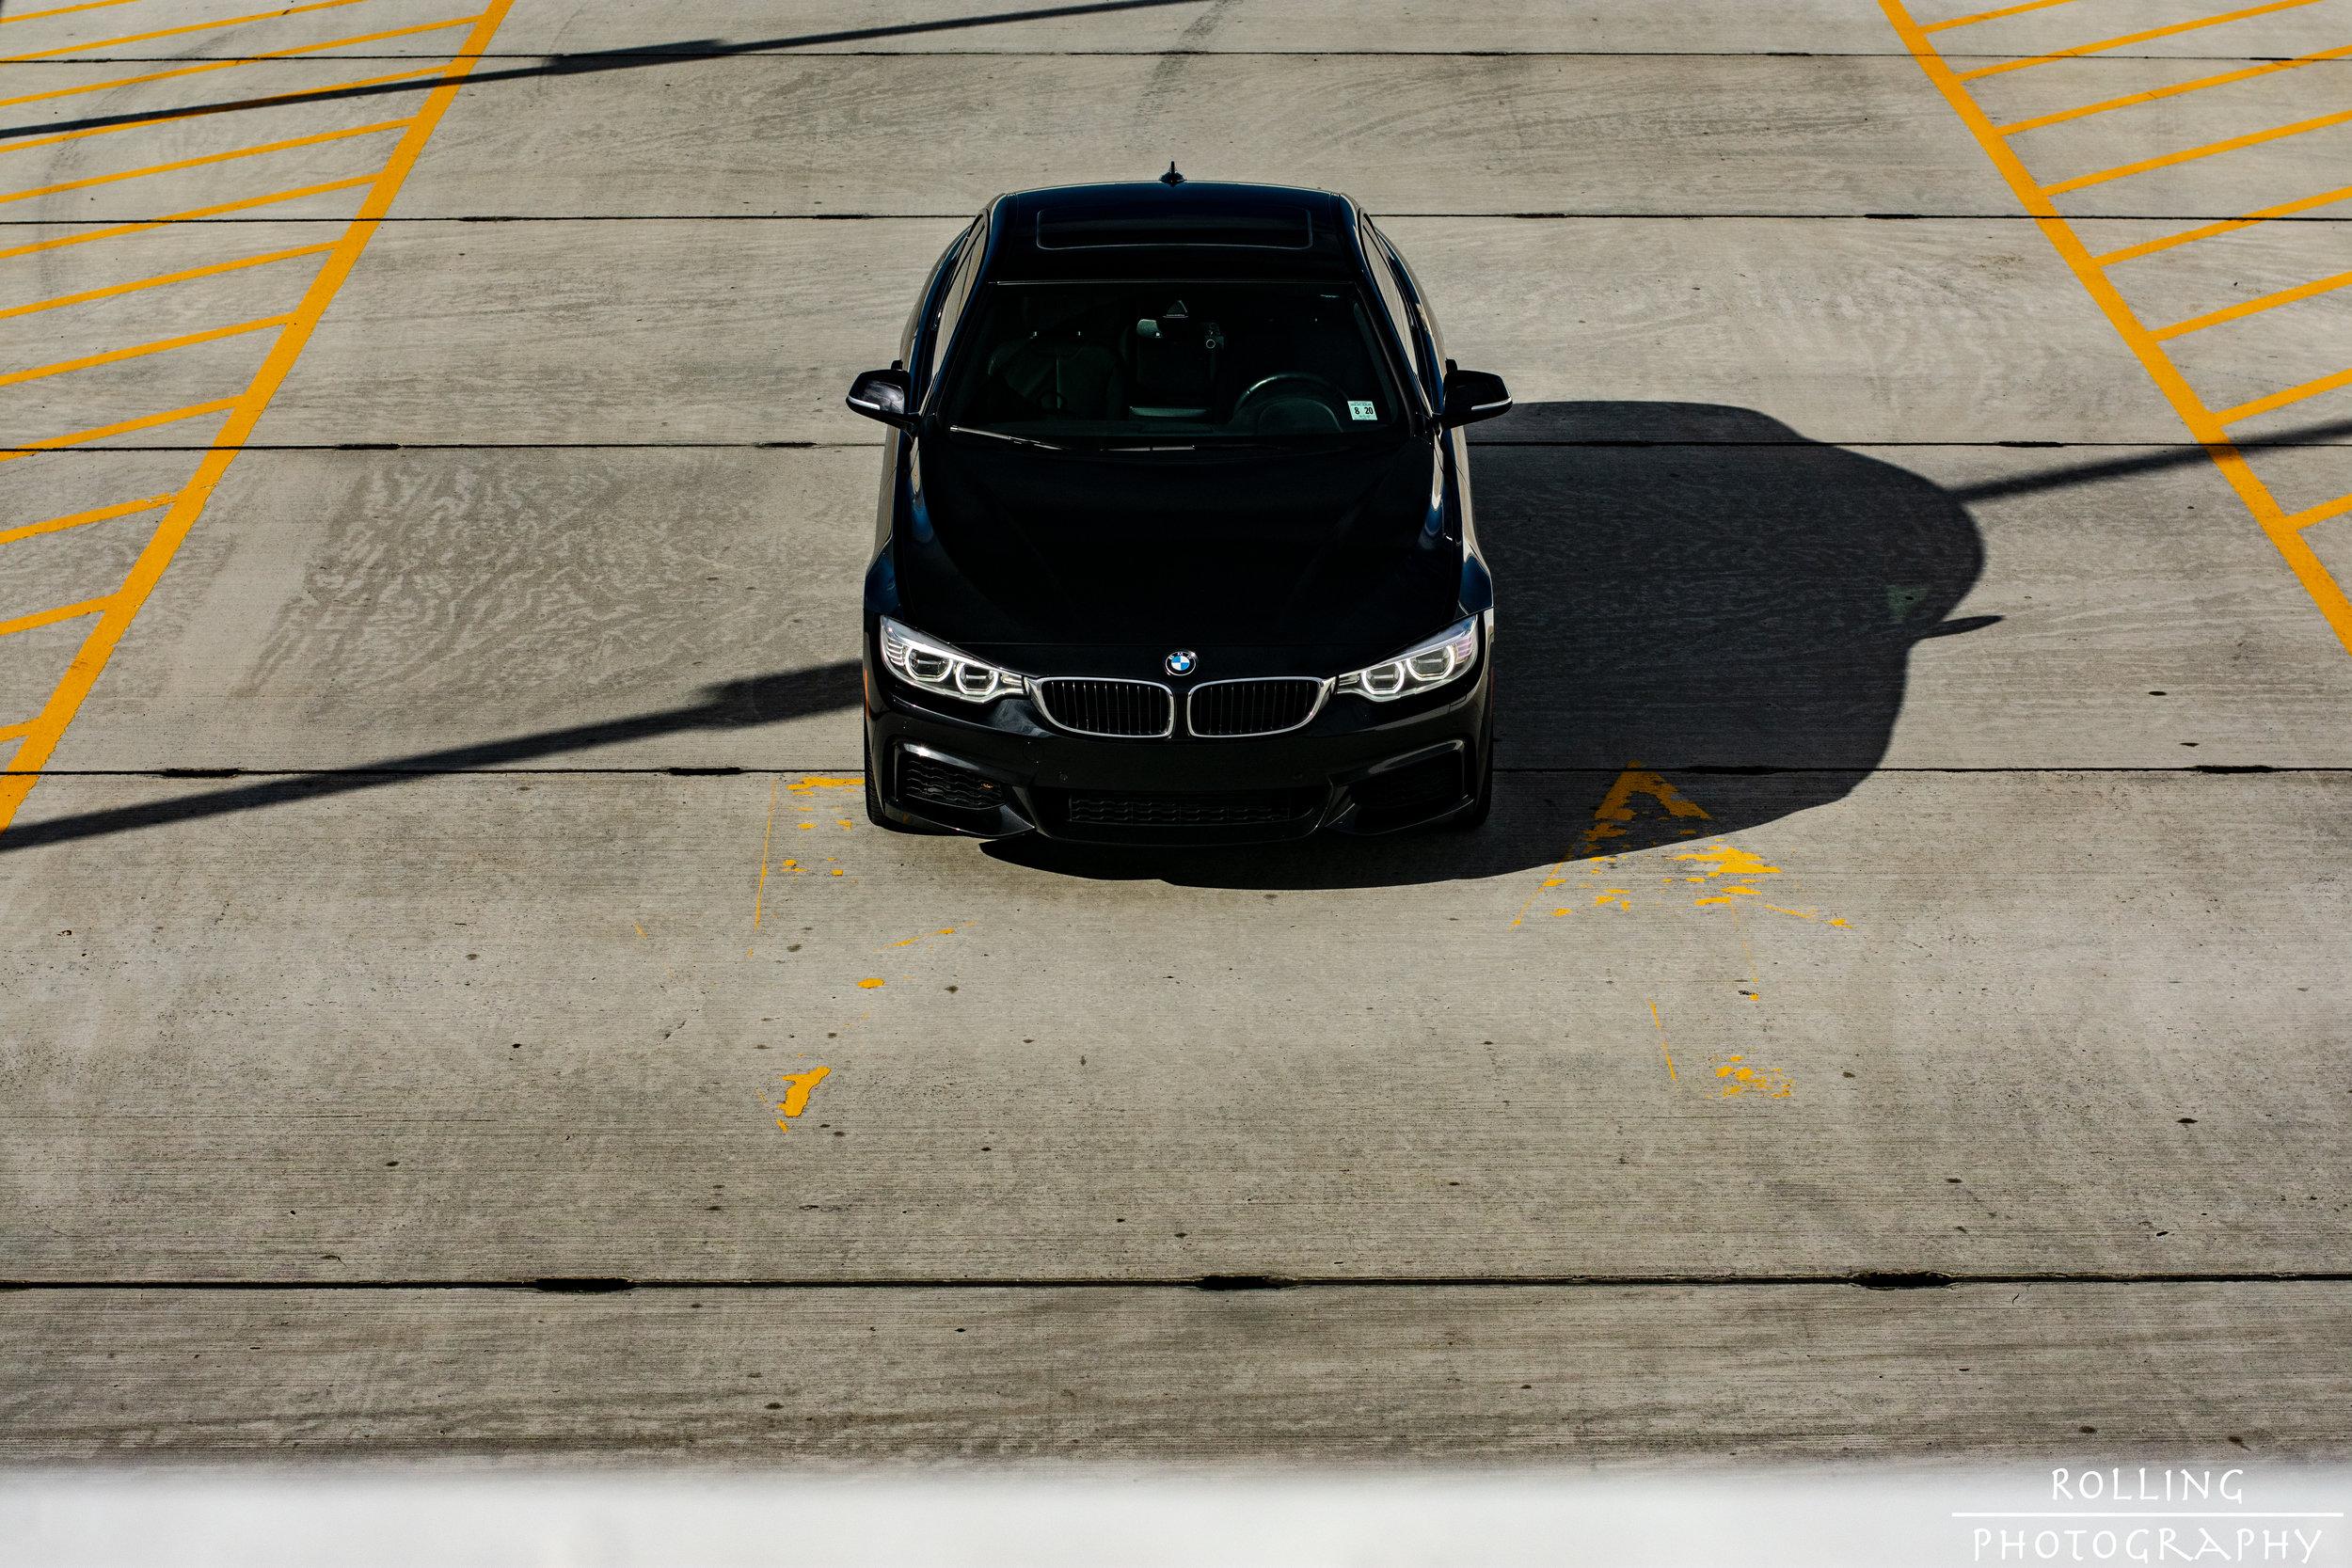 maya_f32 Garage Roof High Low Shot.jpg